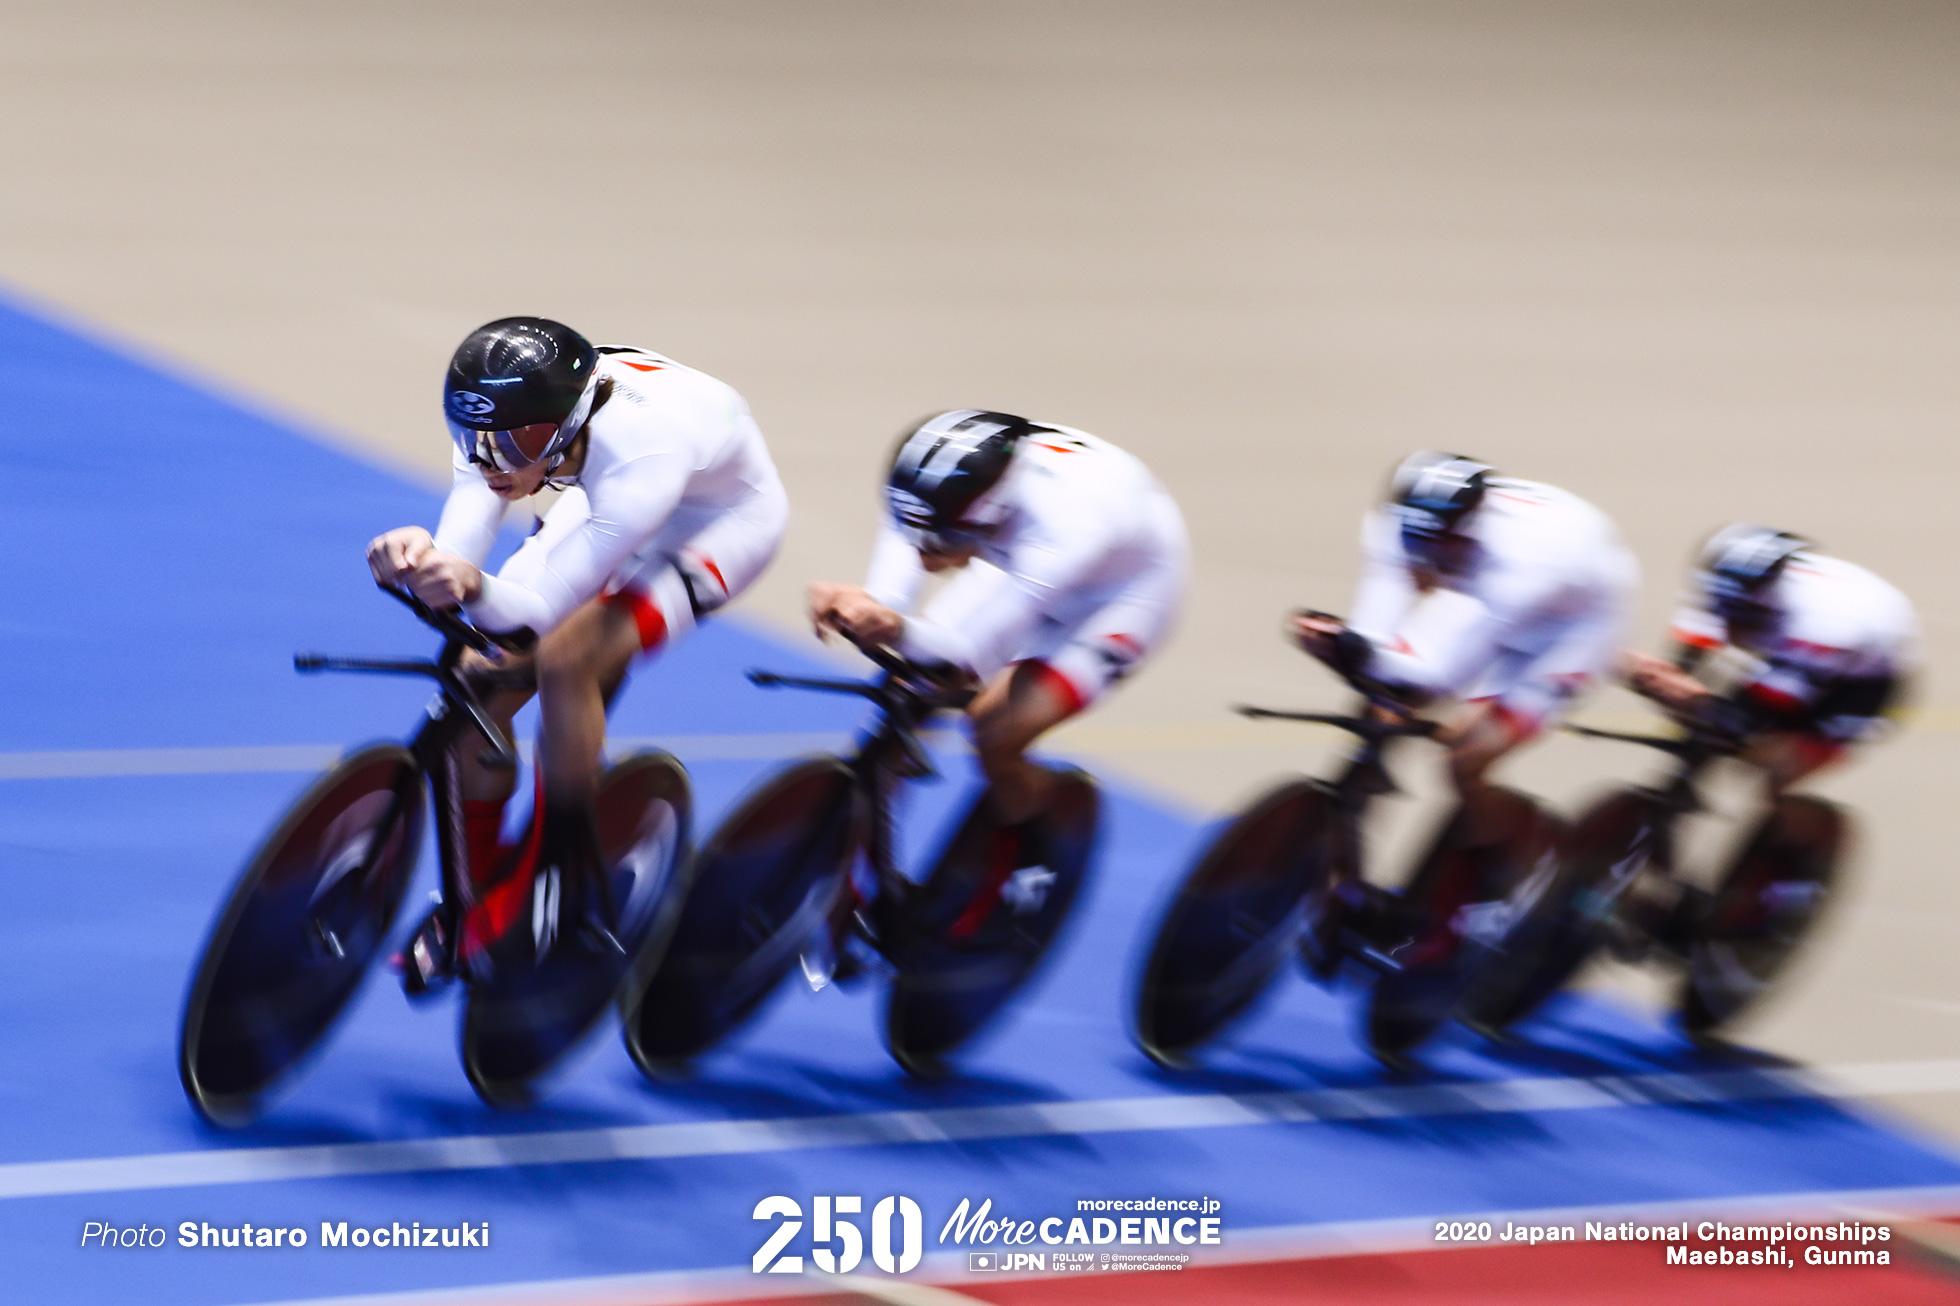 TEAM BRIDGESTONE CYCLING /男子チームパシュート/2020全日本選手権トラック